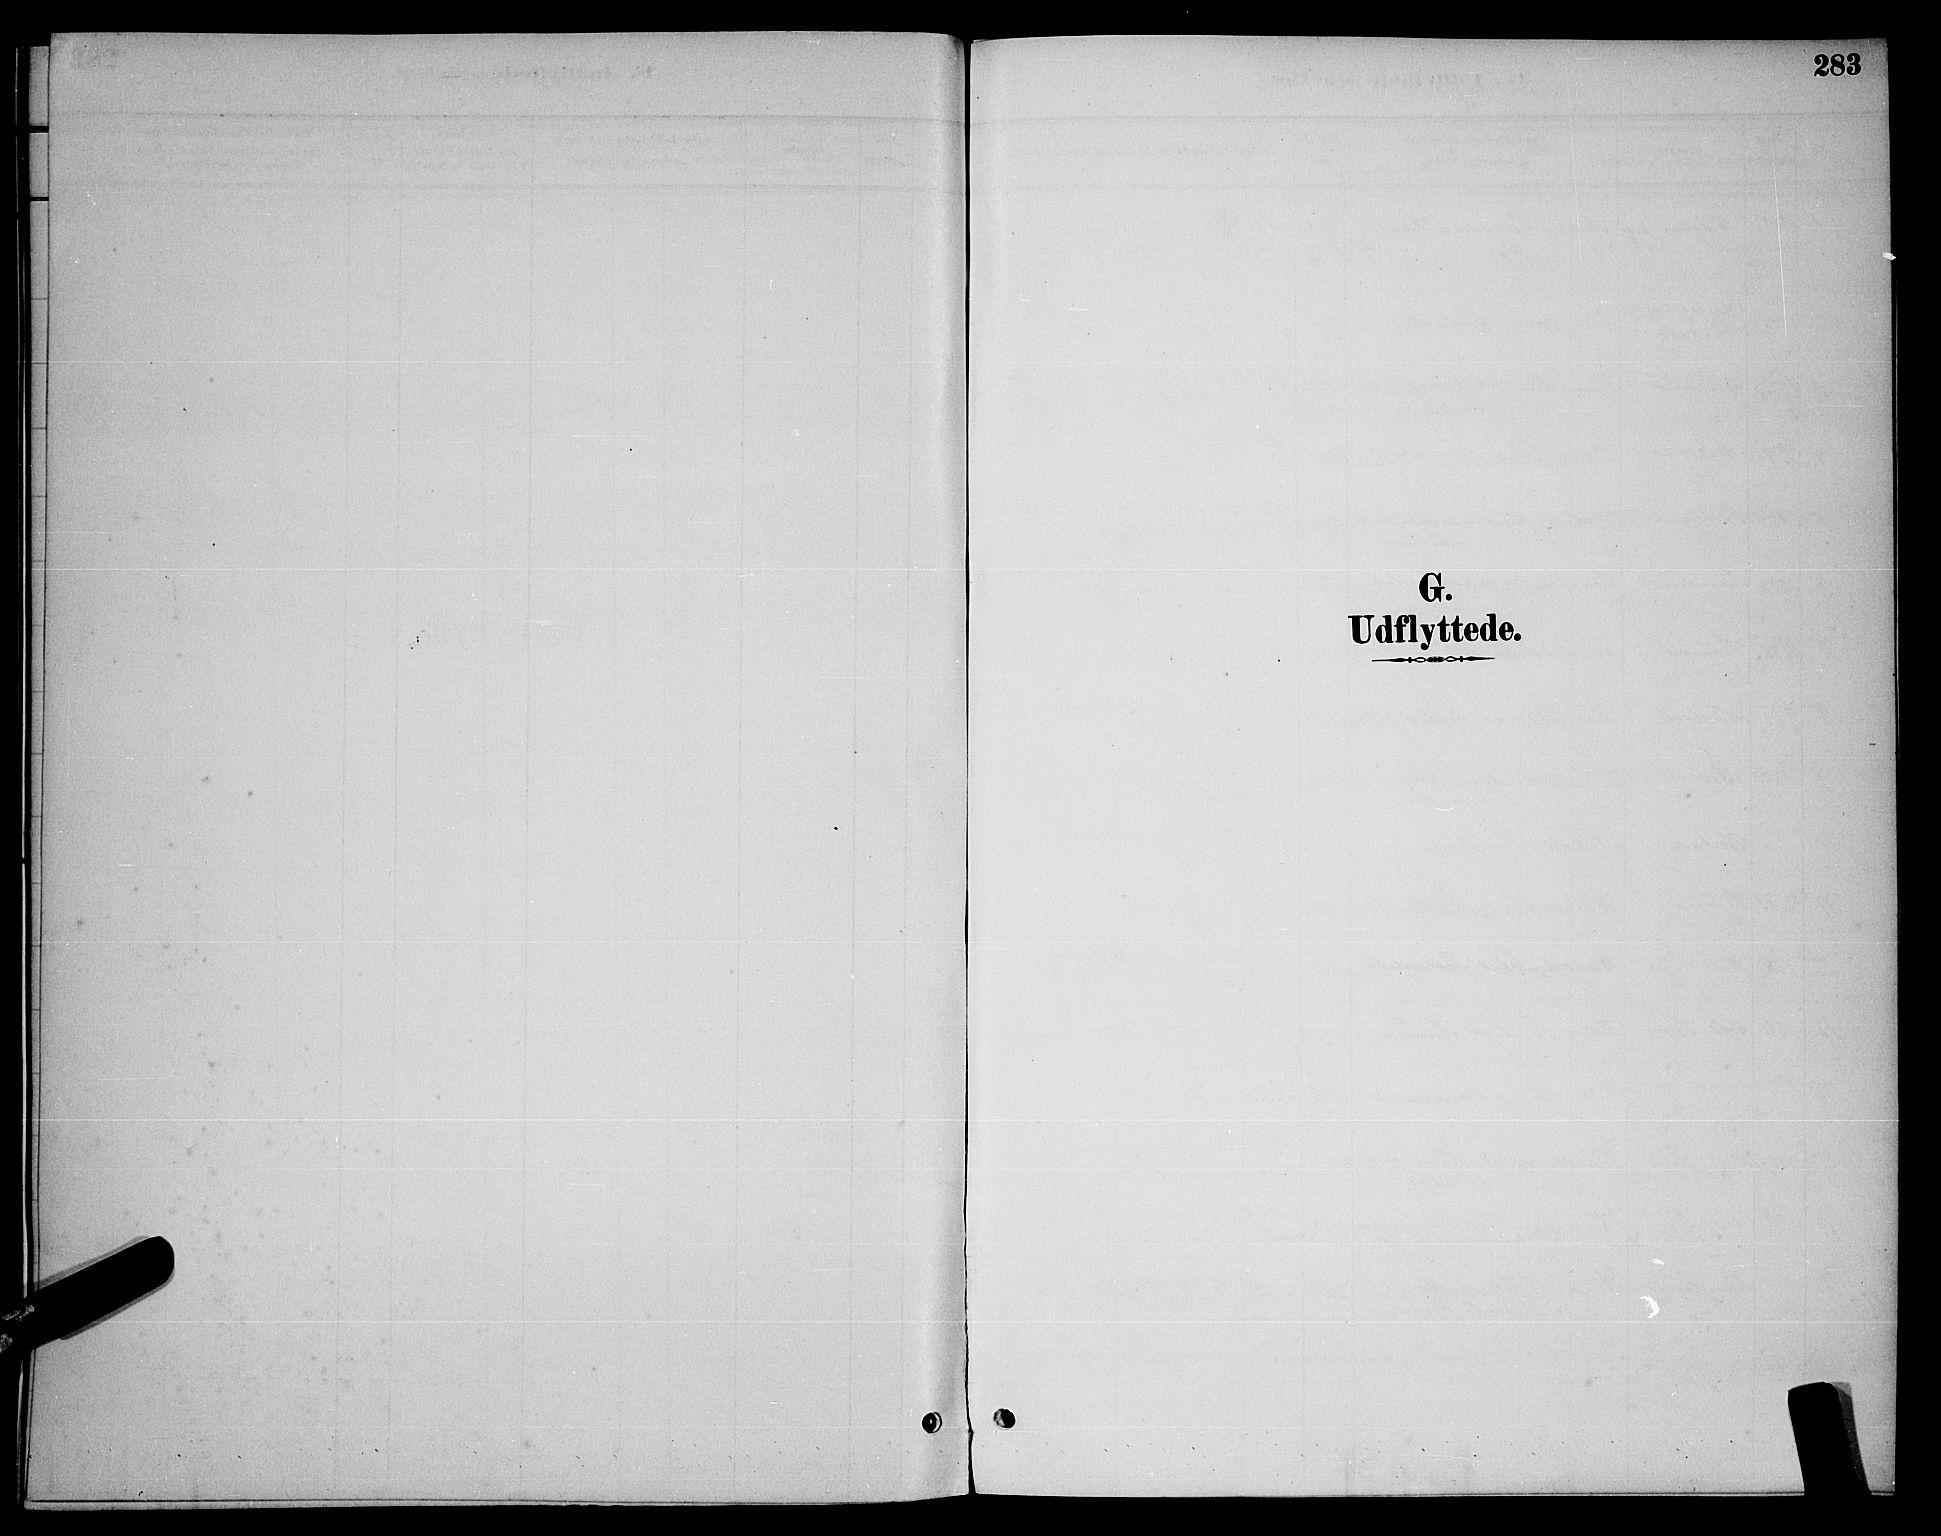 SAT, Ministerialprotokoller, klokkerbøker og fødselsregistre - Nordland, 863/L0914: Klokkerbok nr. 863C04, 1886-1897, s. 283